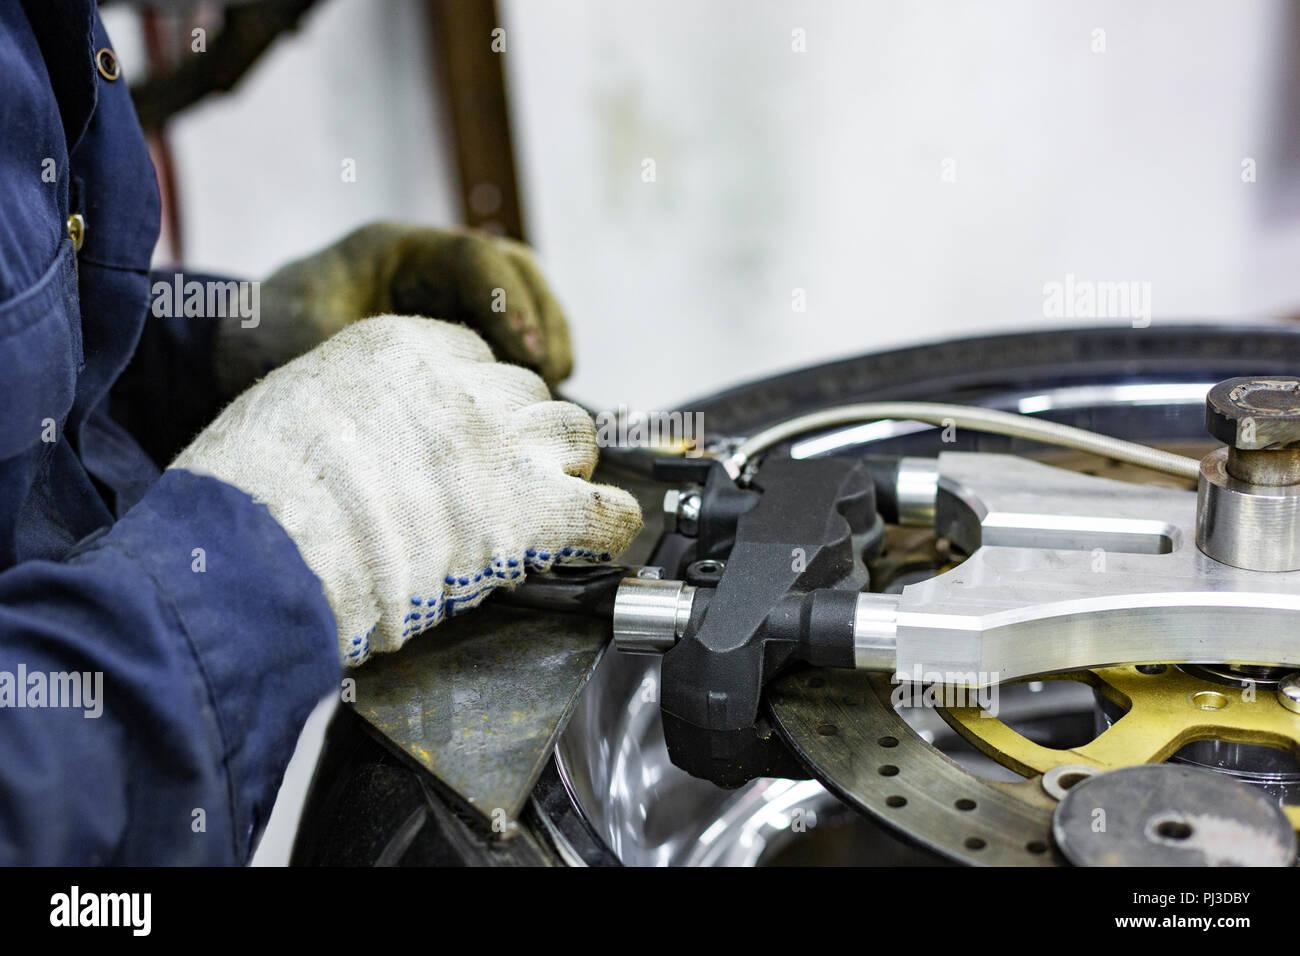 Professionelle Kfz-Mechaniker arbeiten in Auto Reparatur Service Stockbild